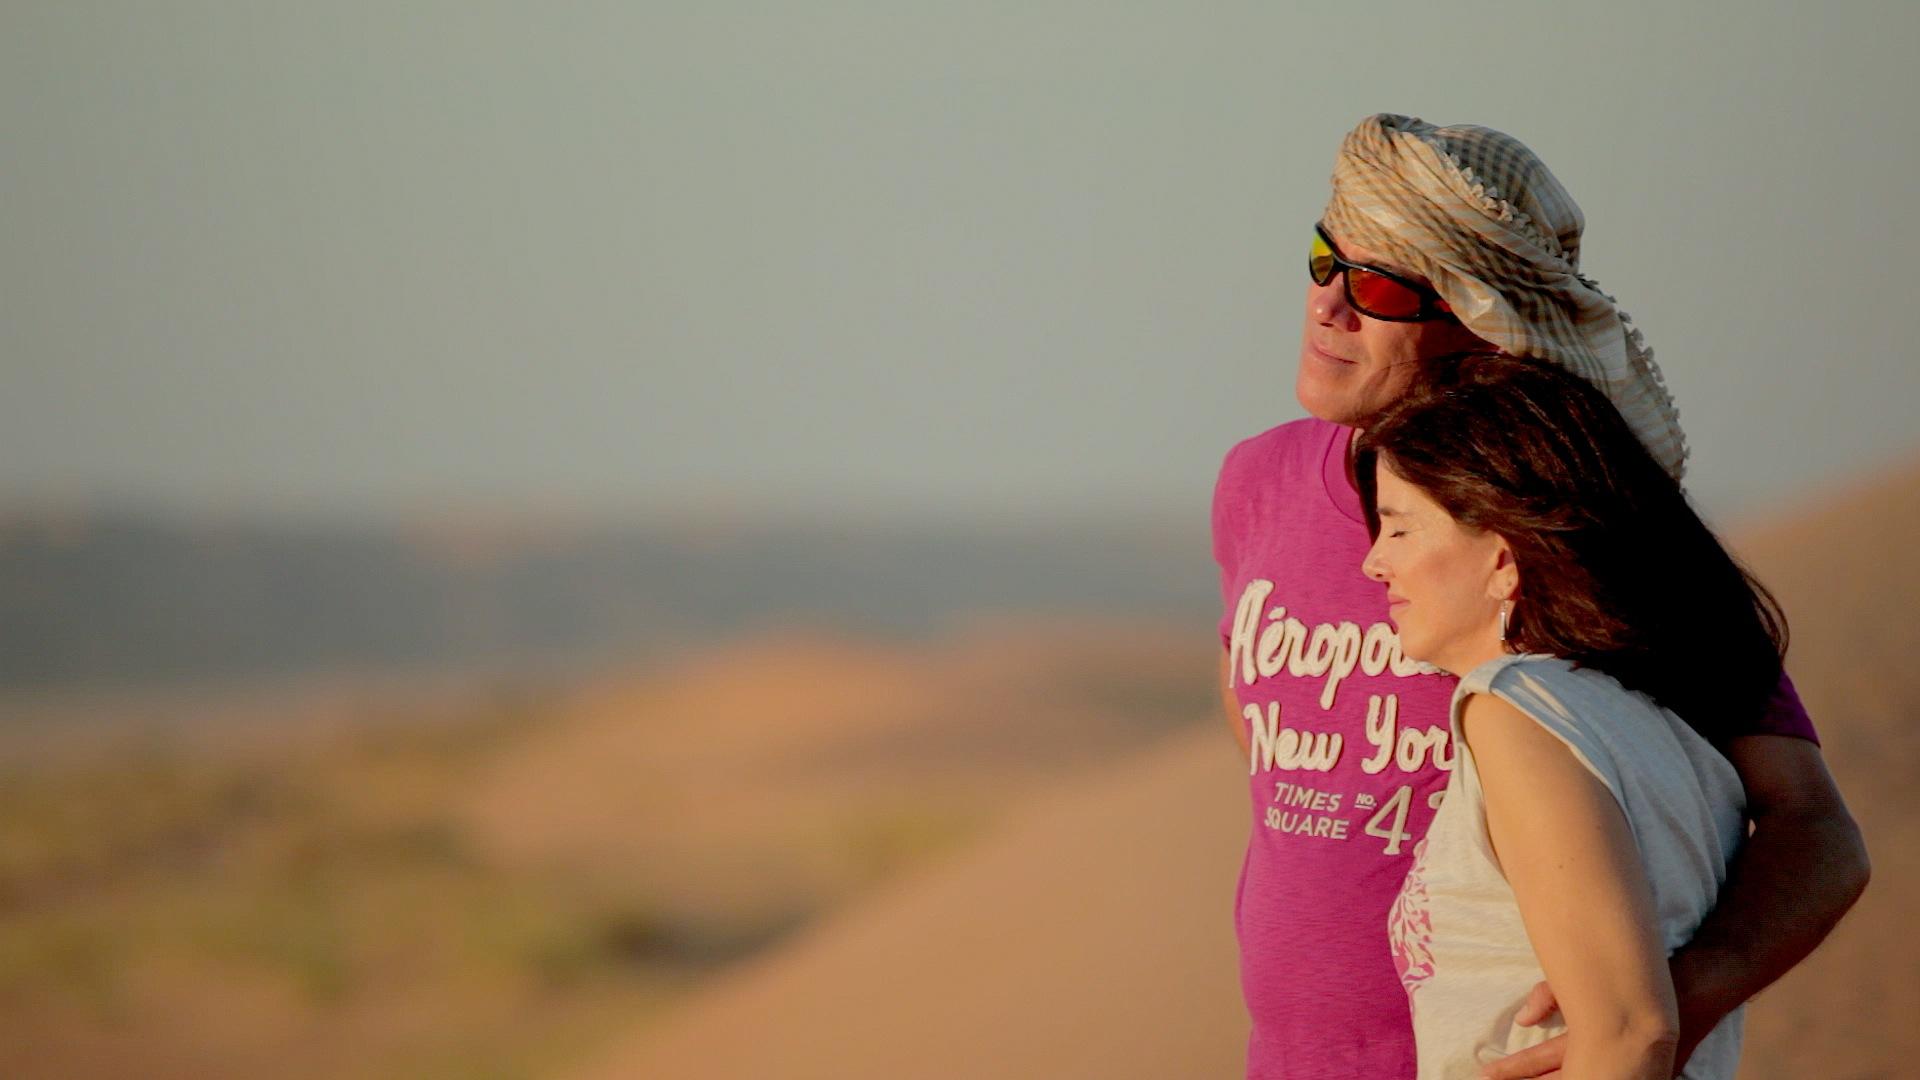 Taking in the breathtaking scenery in the Desert